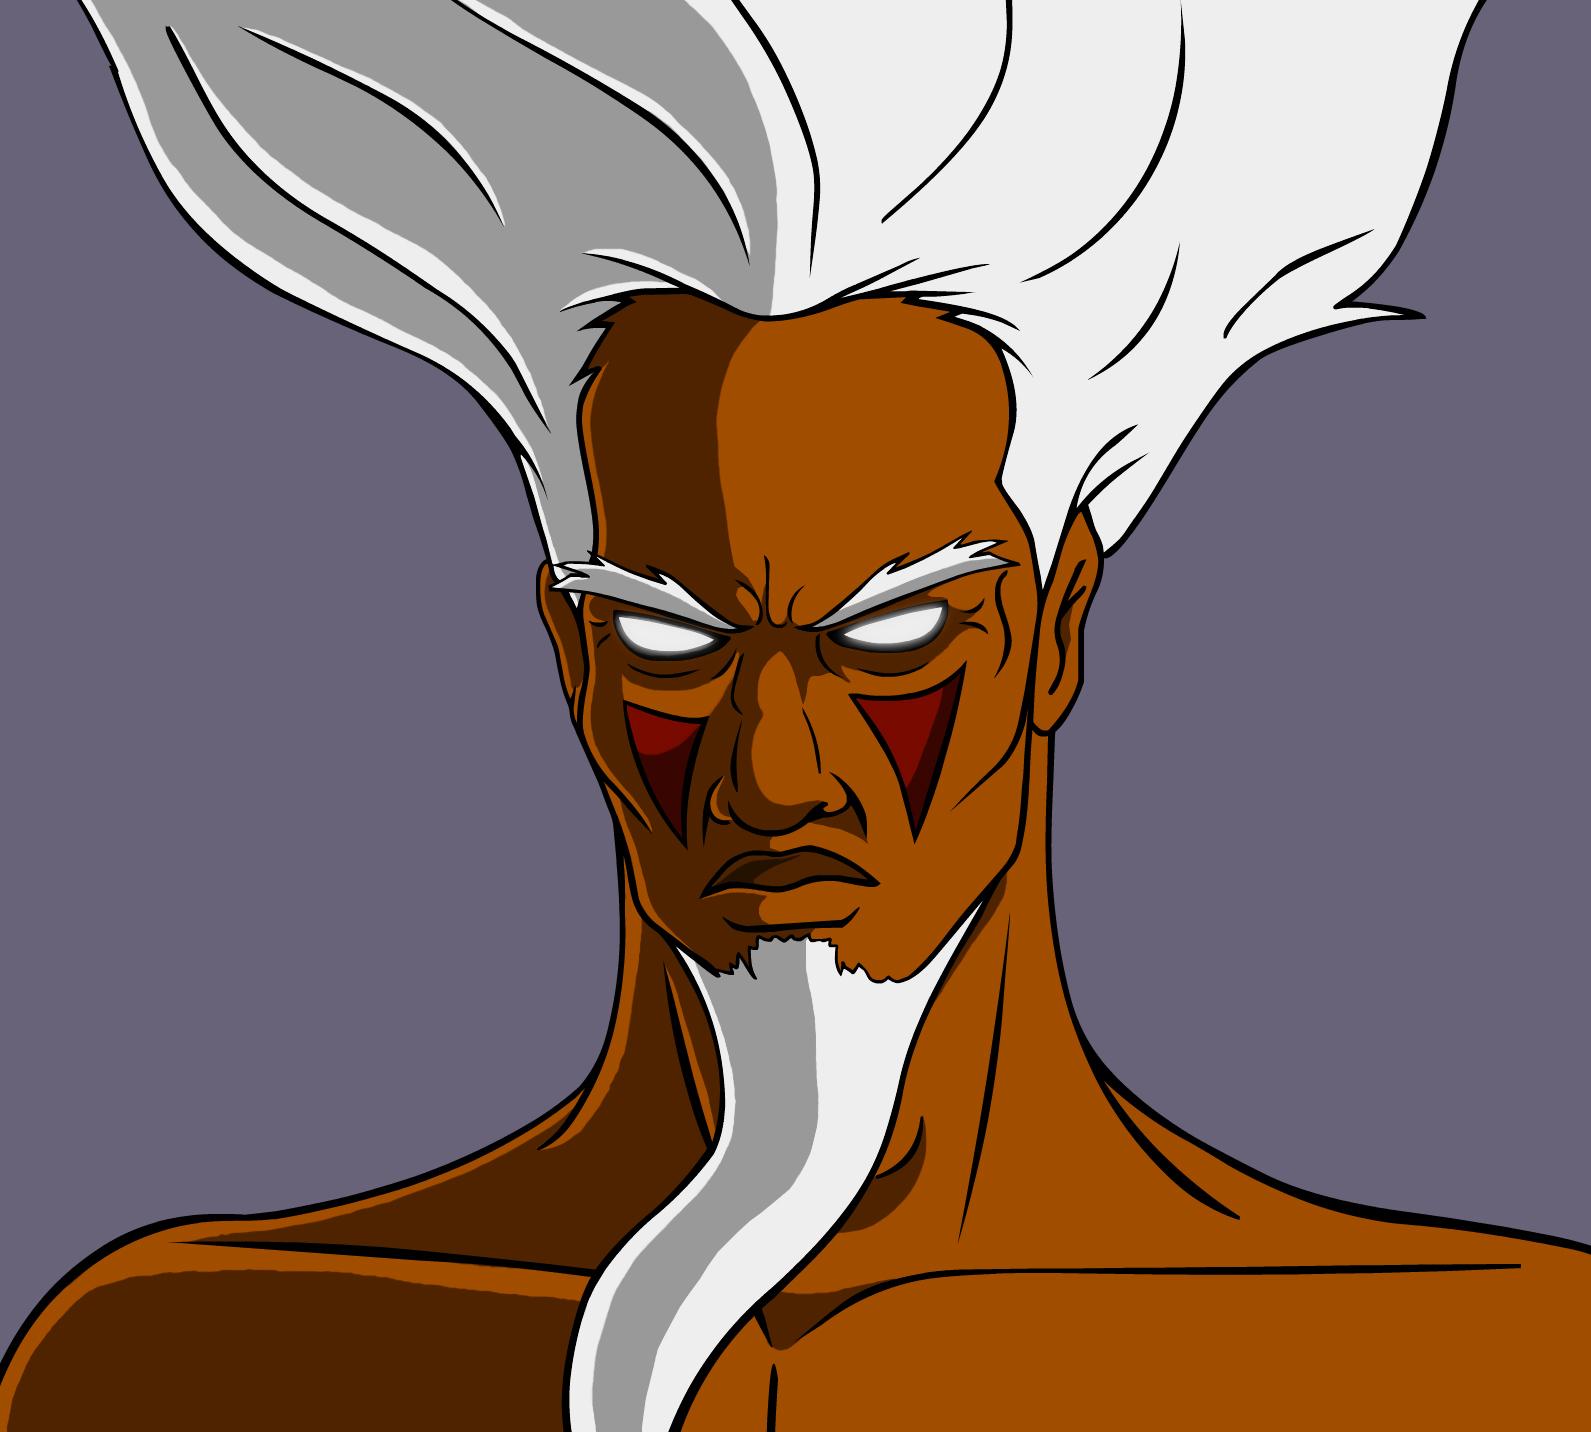 Lord Vimuti